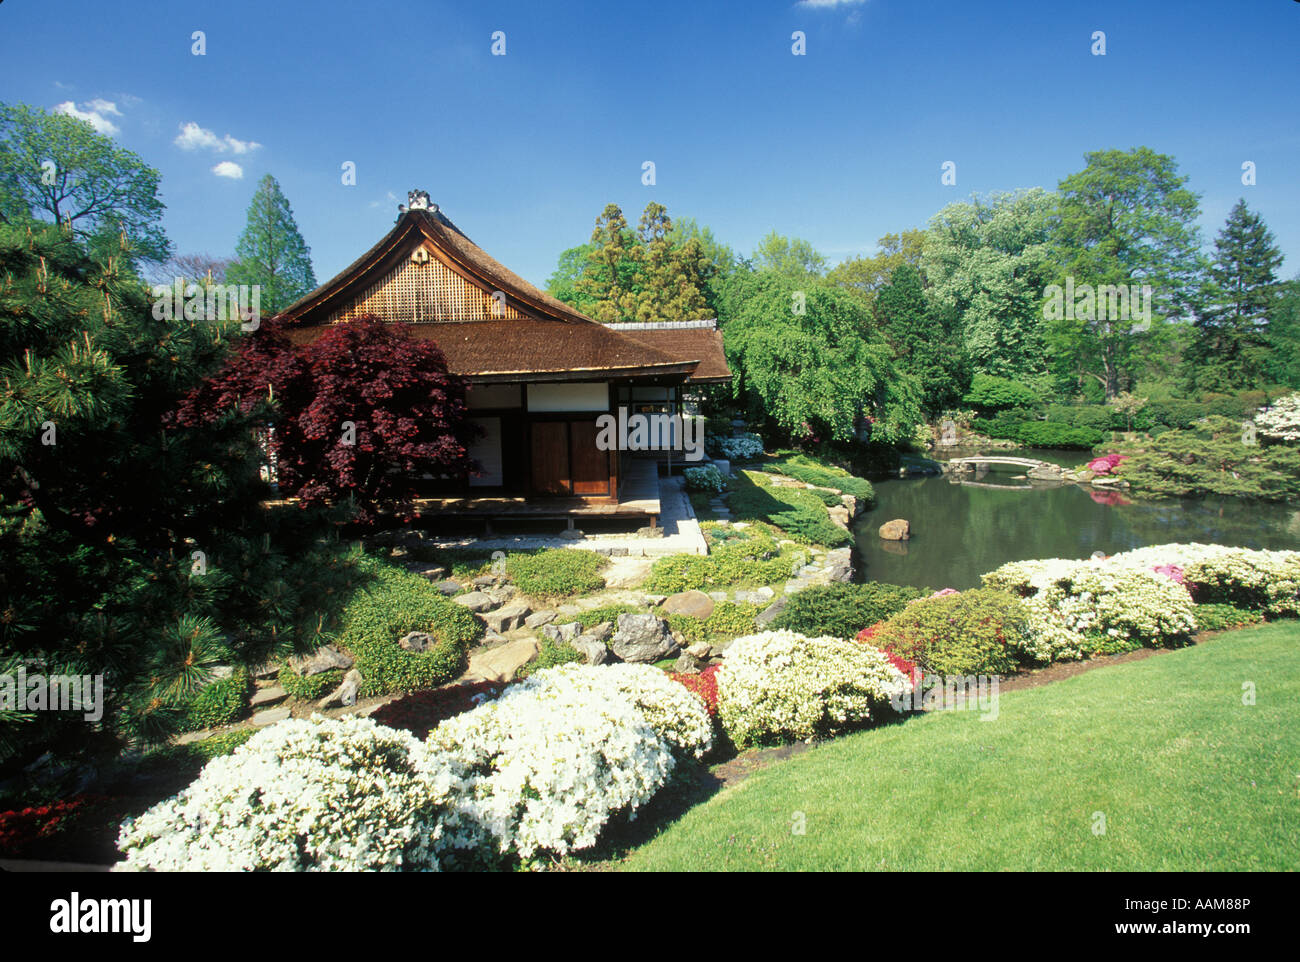 PHILADELPHIA PA JAPANESE HOUSE AND GARDENS IN FAIRMOUNT PARK